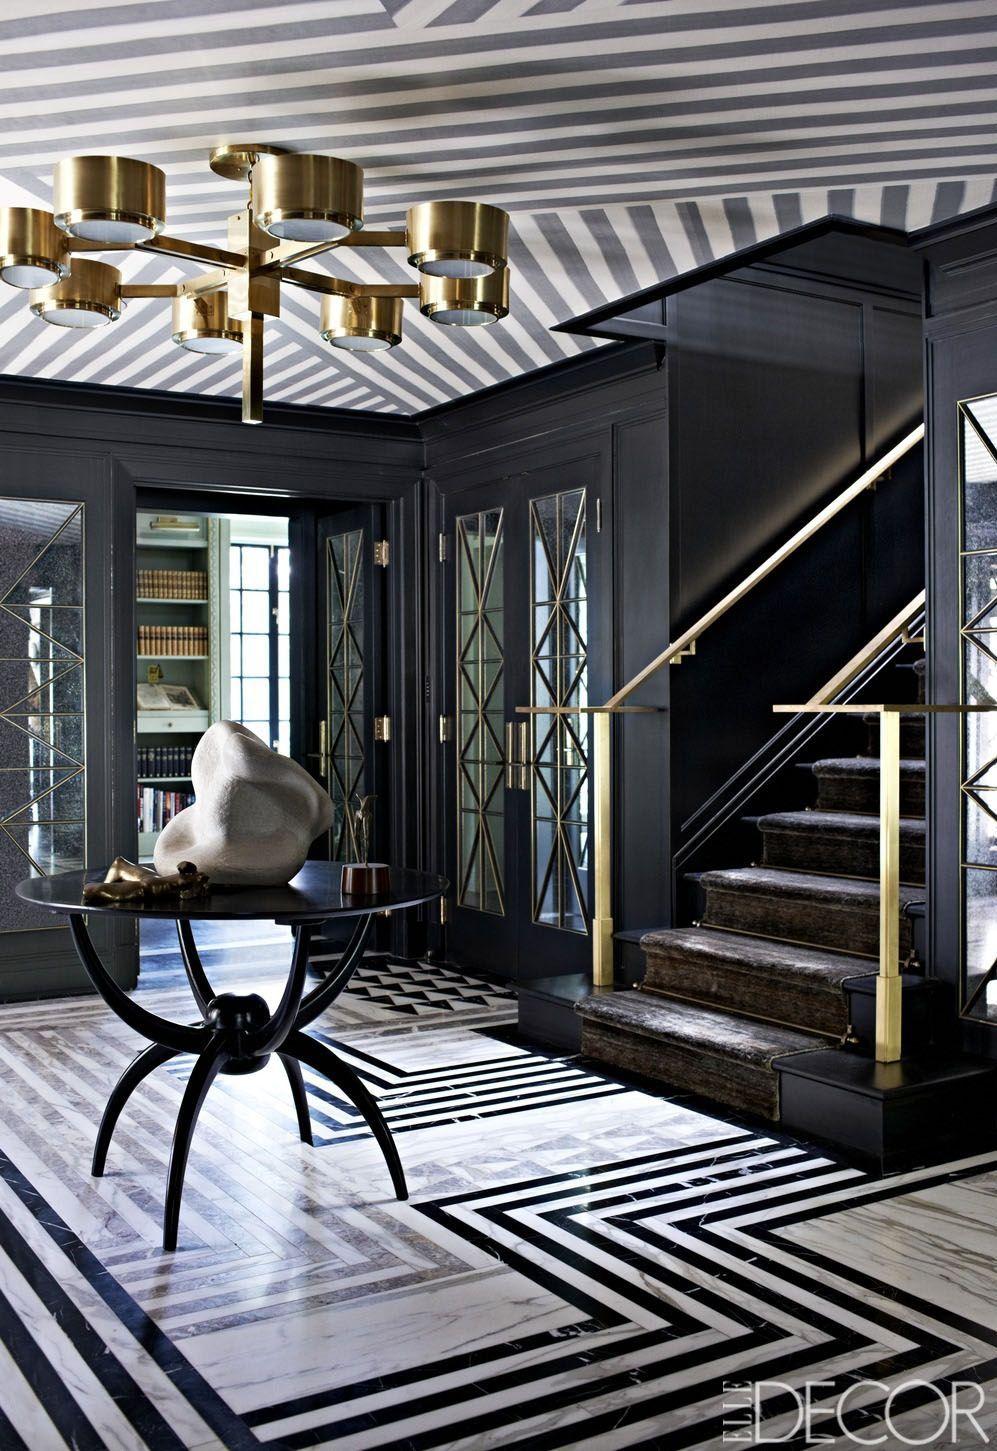 Black floor in the interior